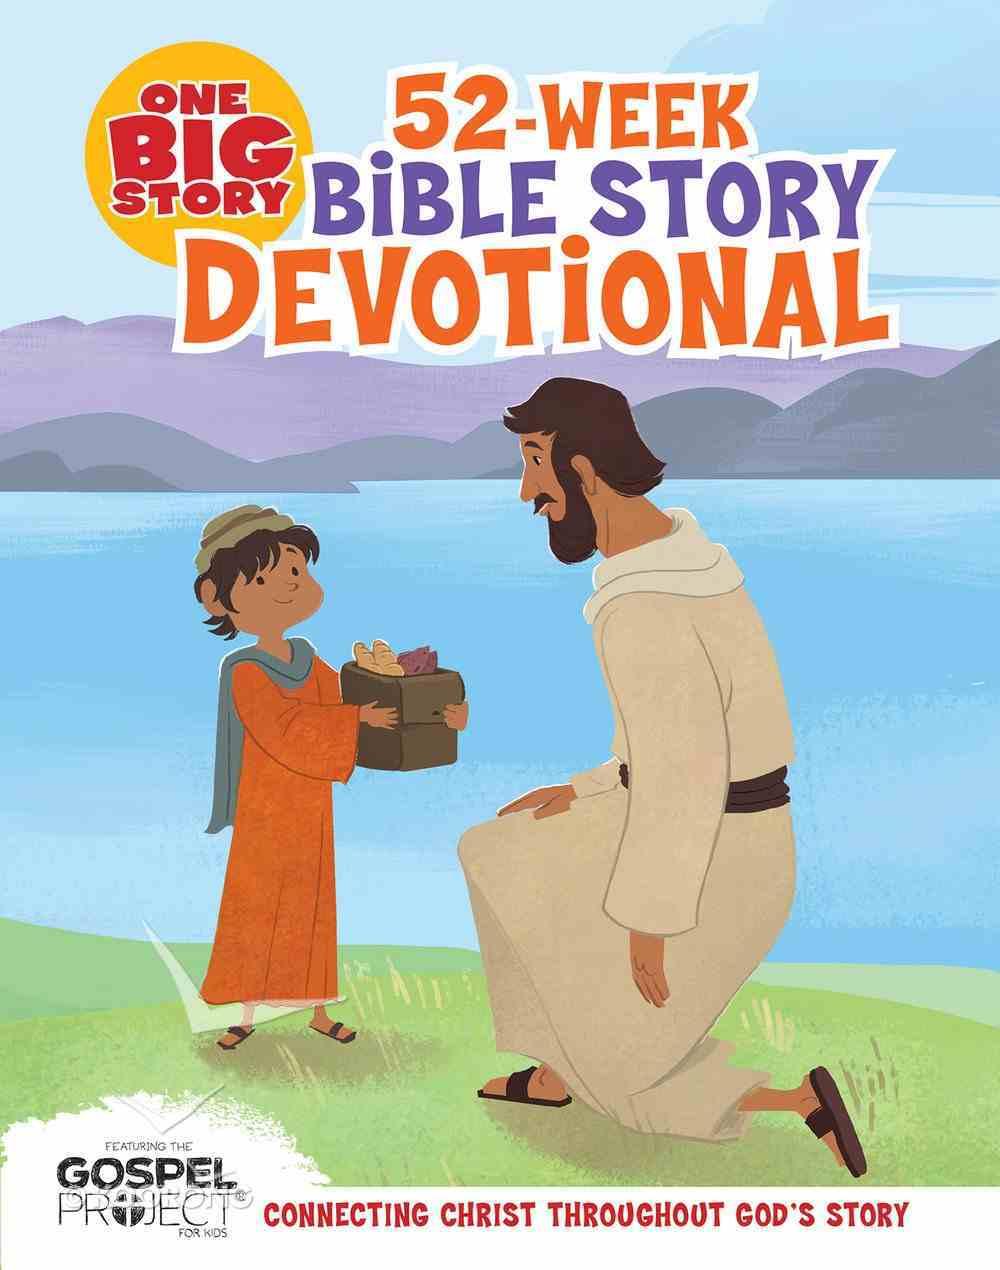 One Big Story 52-Week Bible Story Devotional eBook